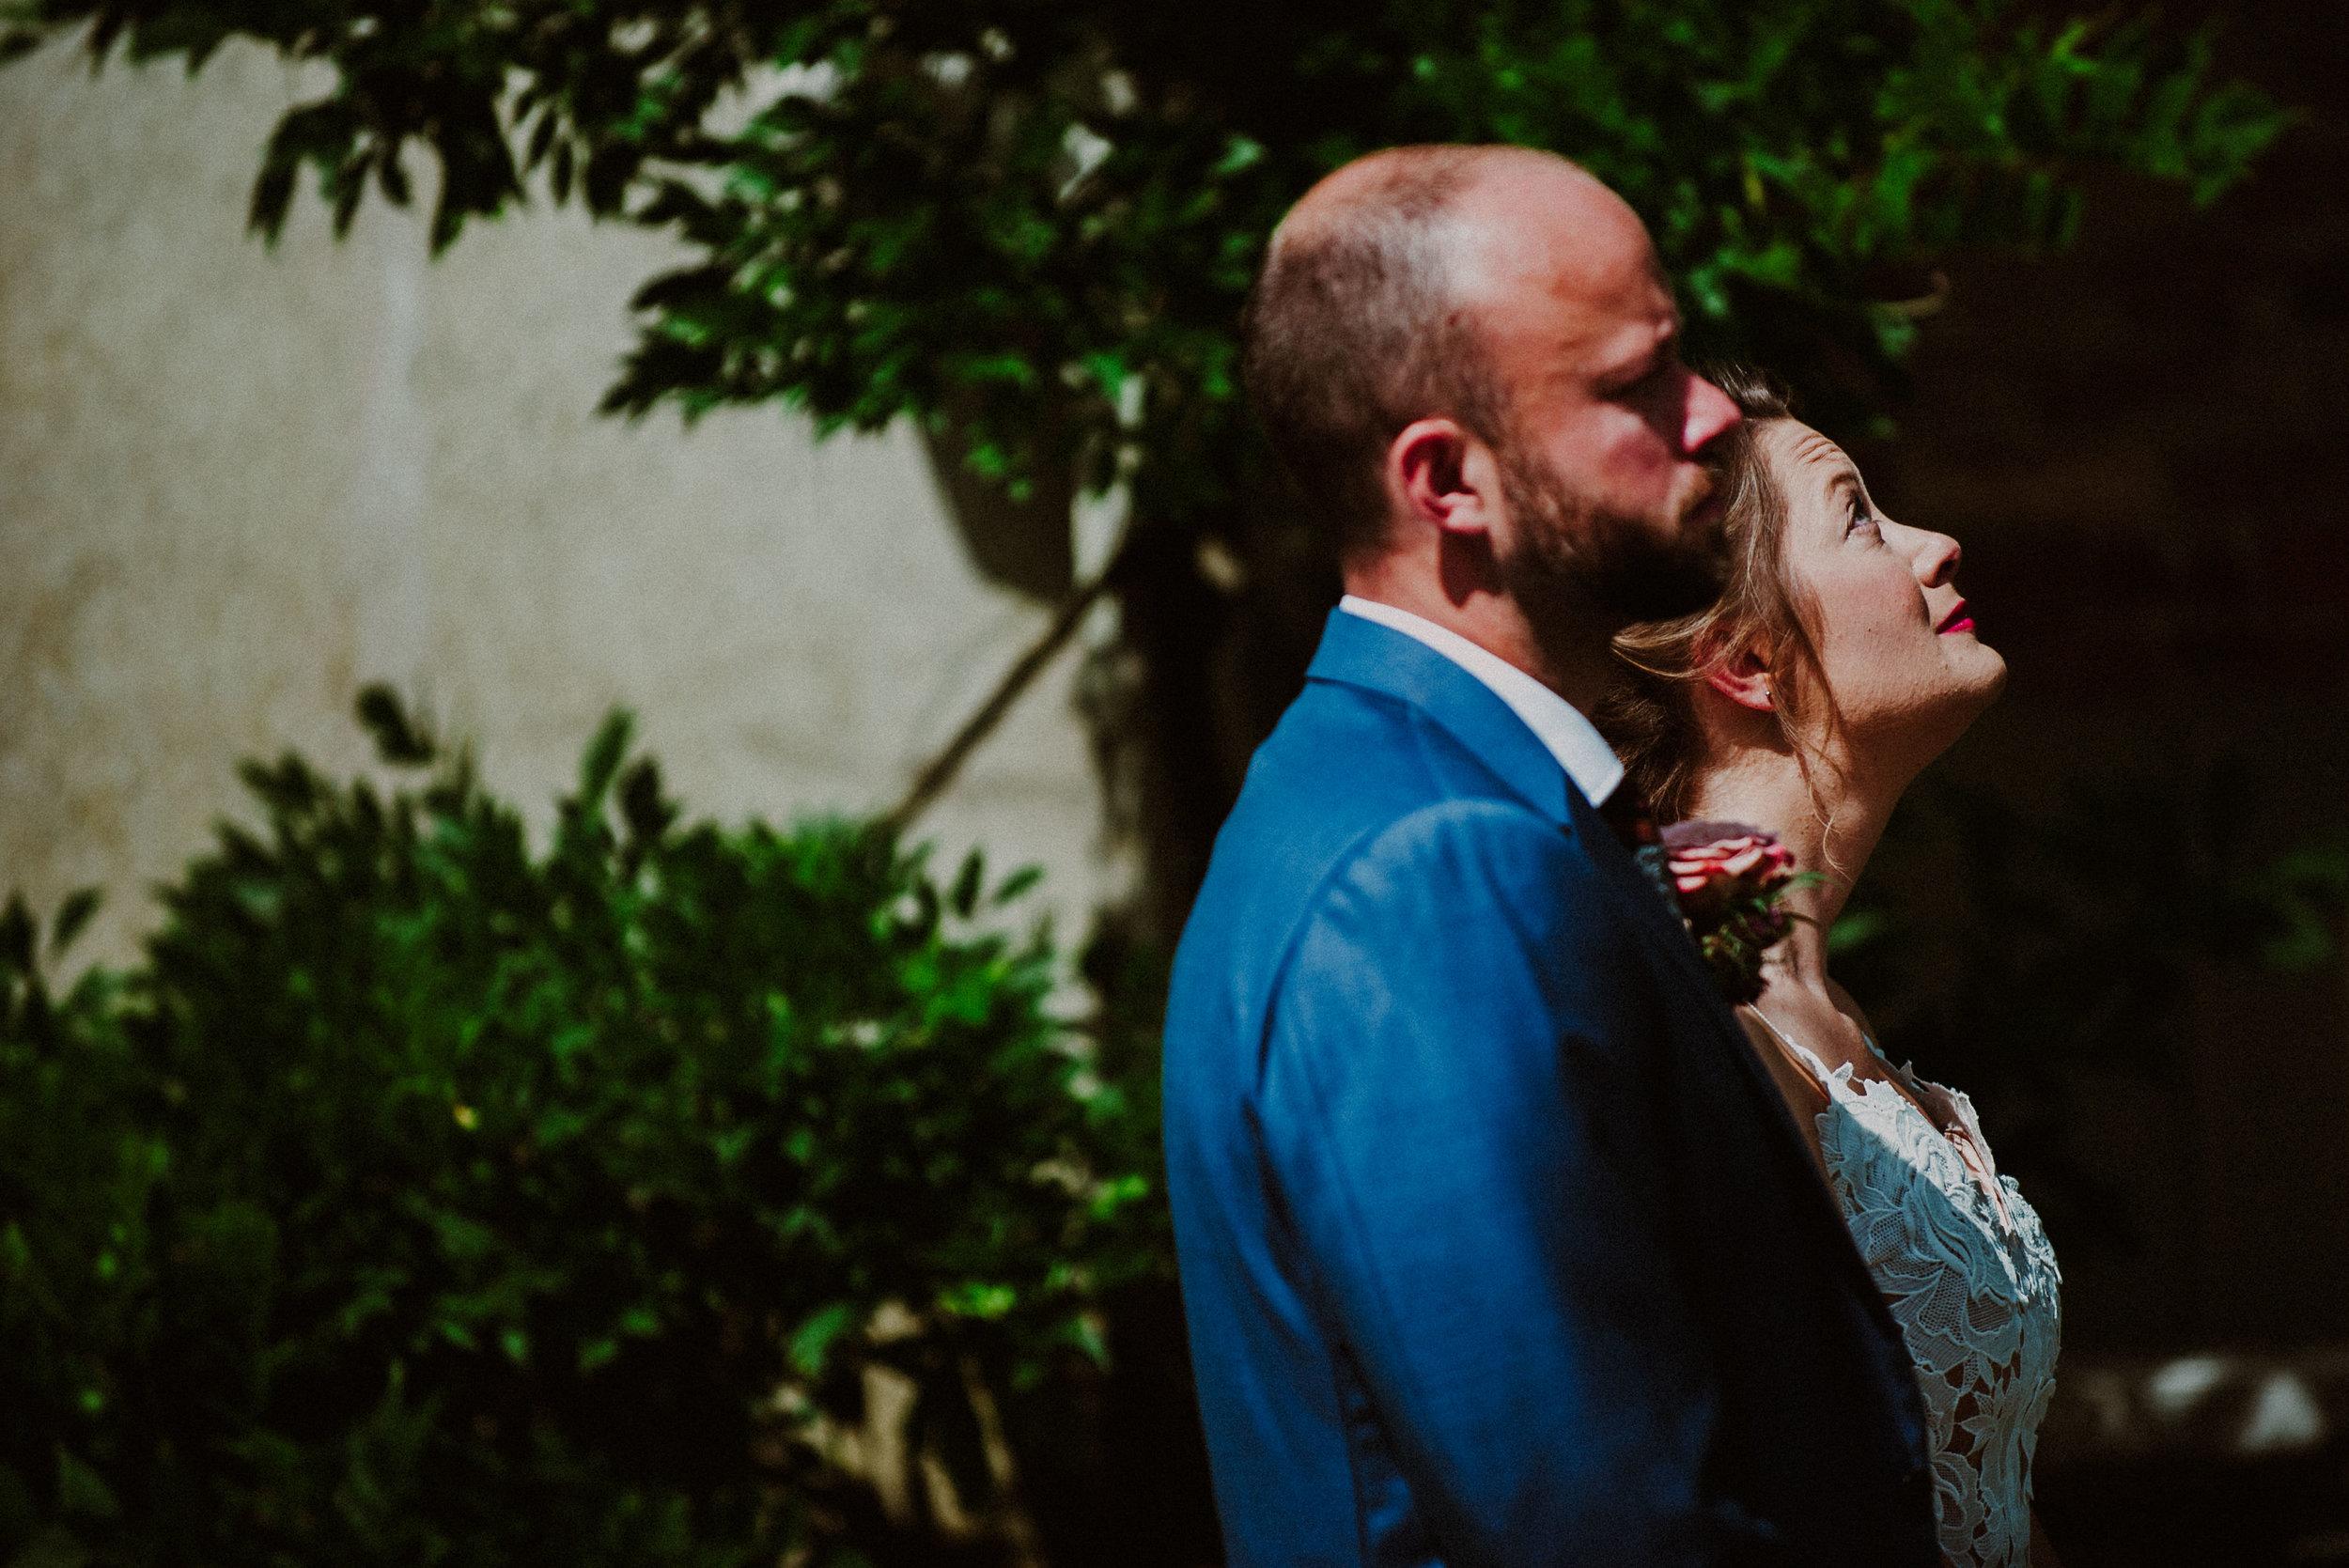 pencarrow-house-wedding-photographer-3.jpg